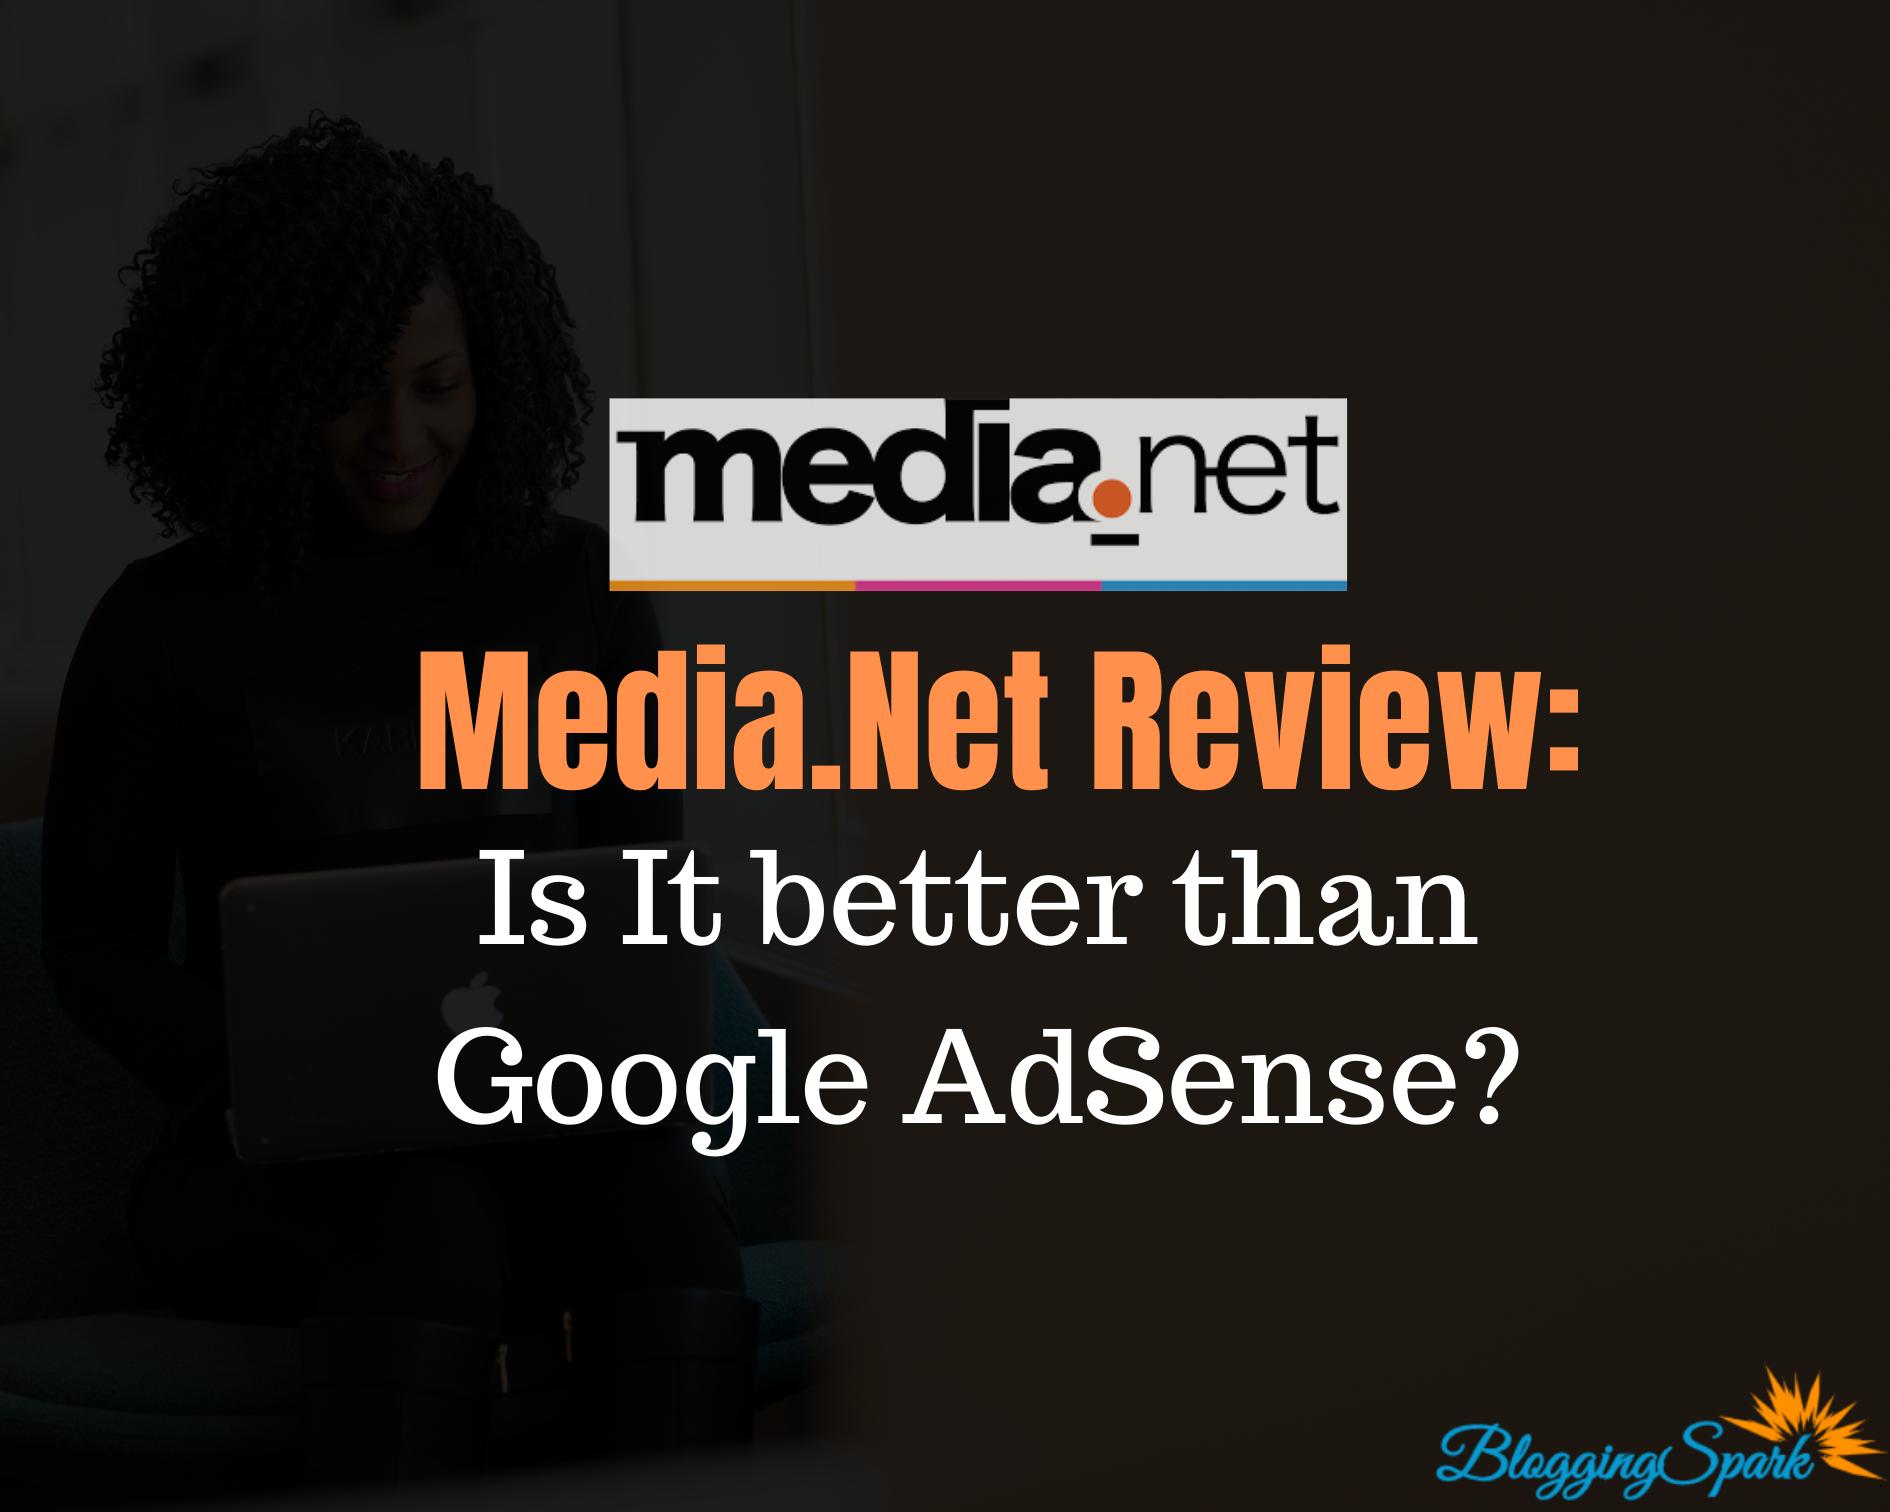 Media.Net Review: Is It better than Google AdSense?